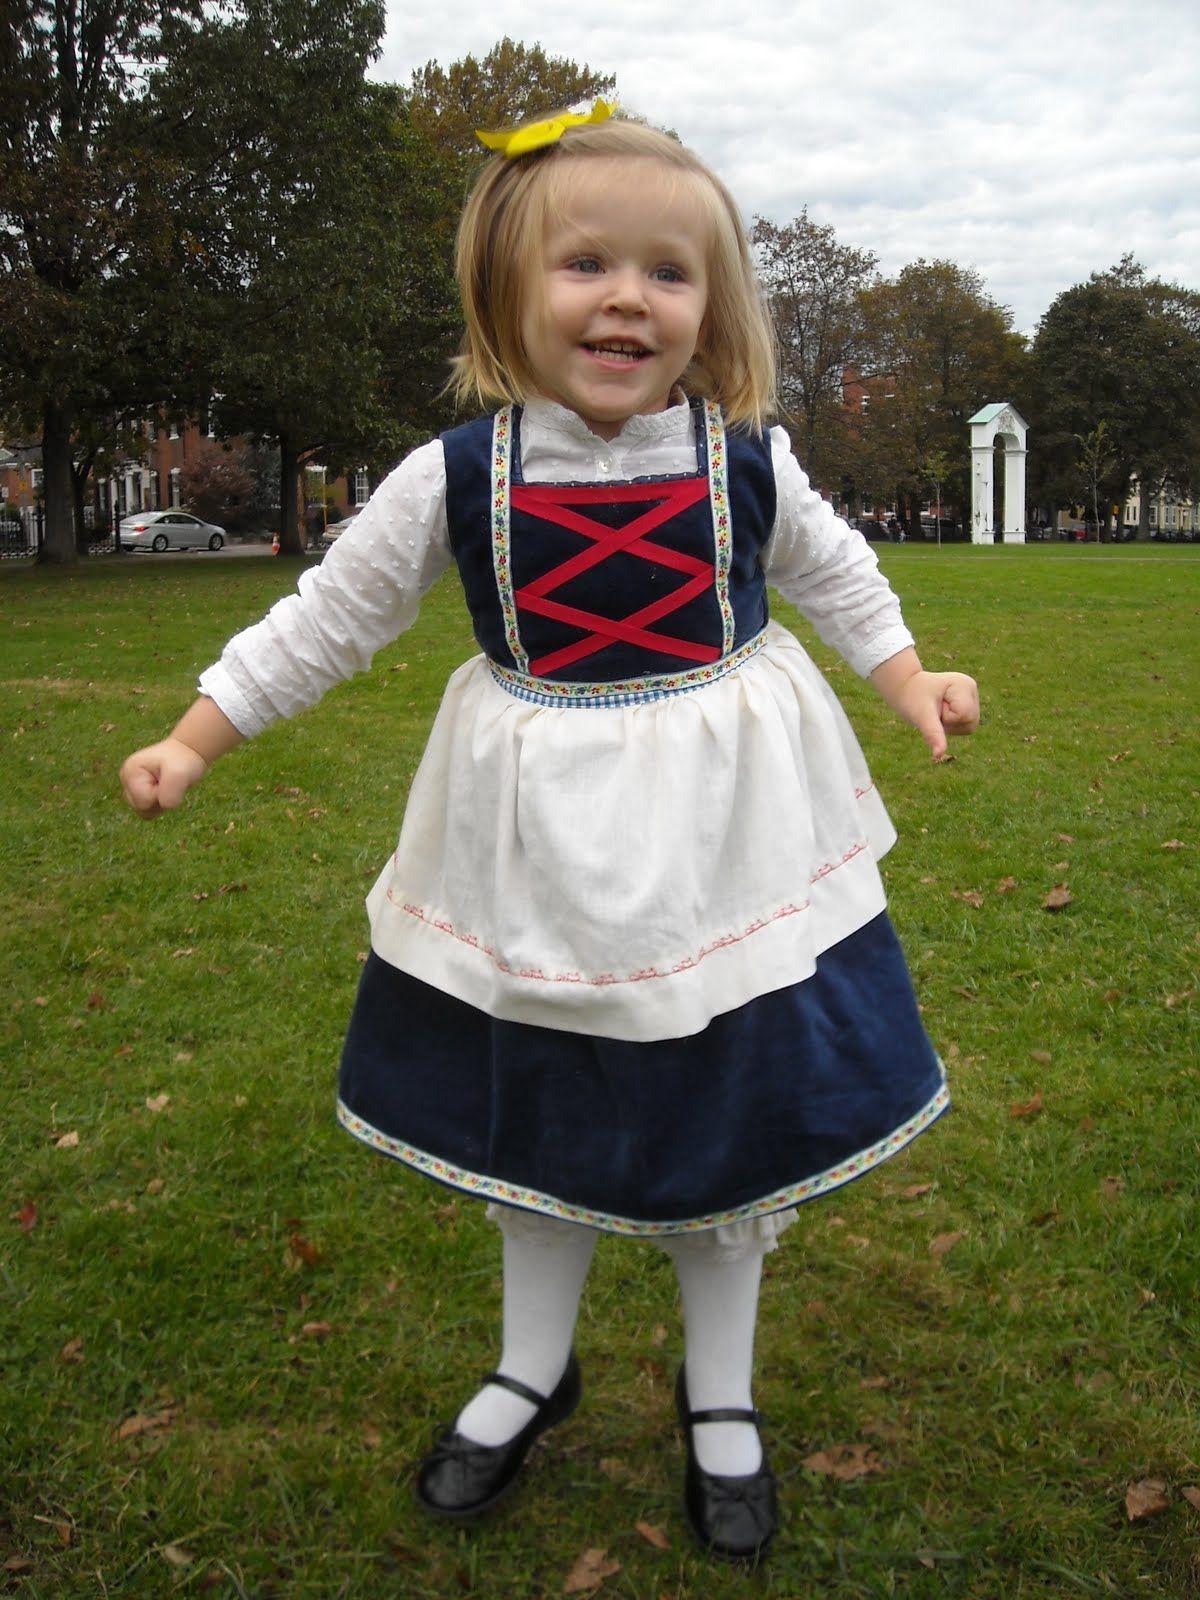 Goldilocks costume costume ideas pinterest goldilocks goldilocks costume solutioingenieria Image collections